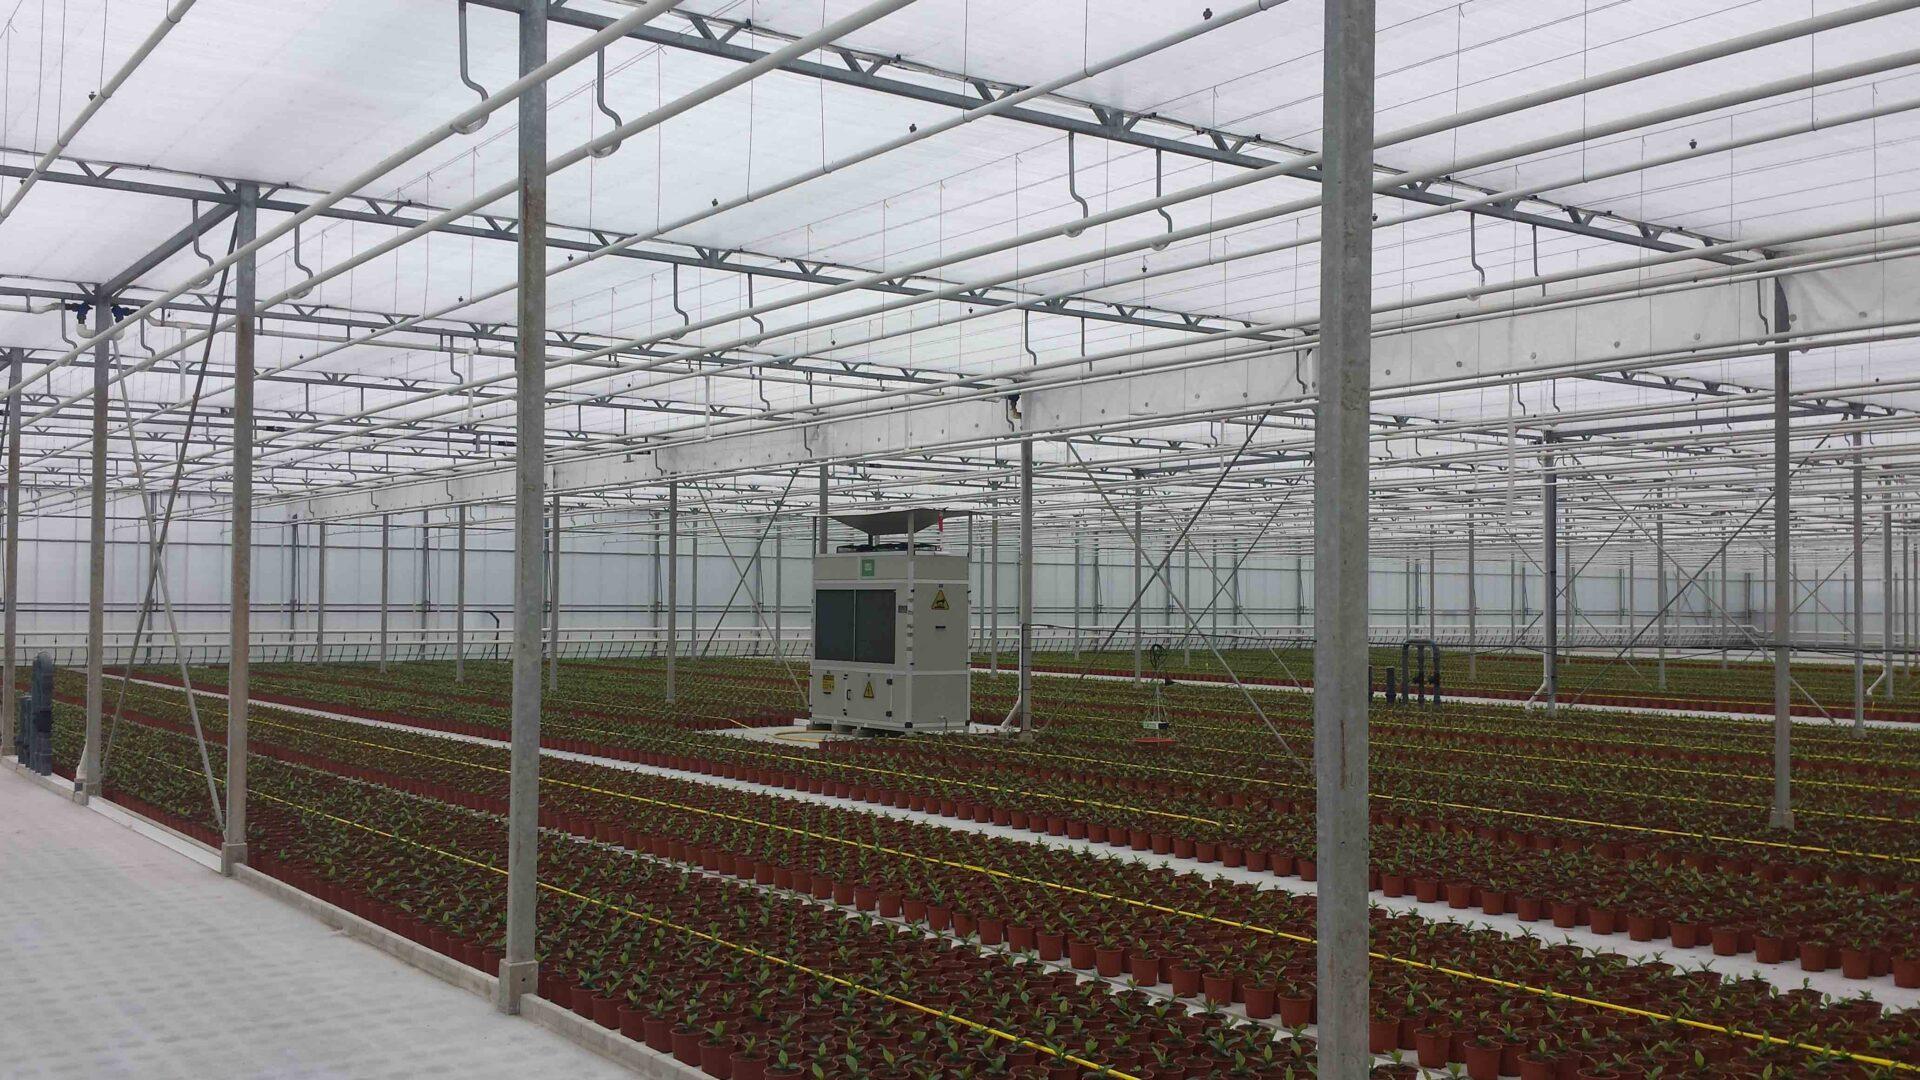 Drygair dehumidifier in herbs greenhouse